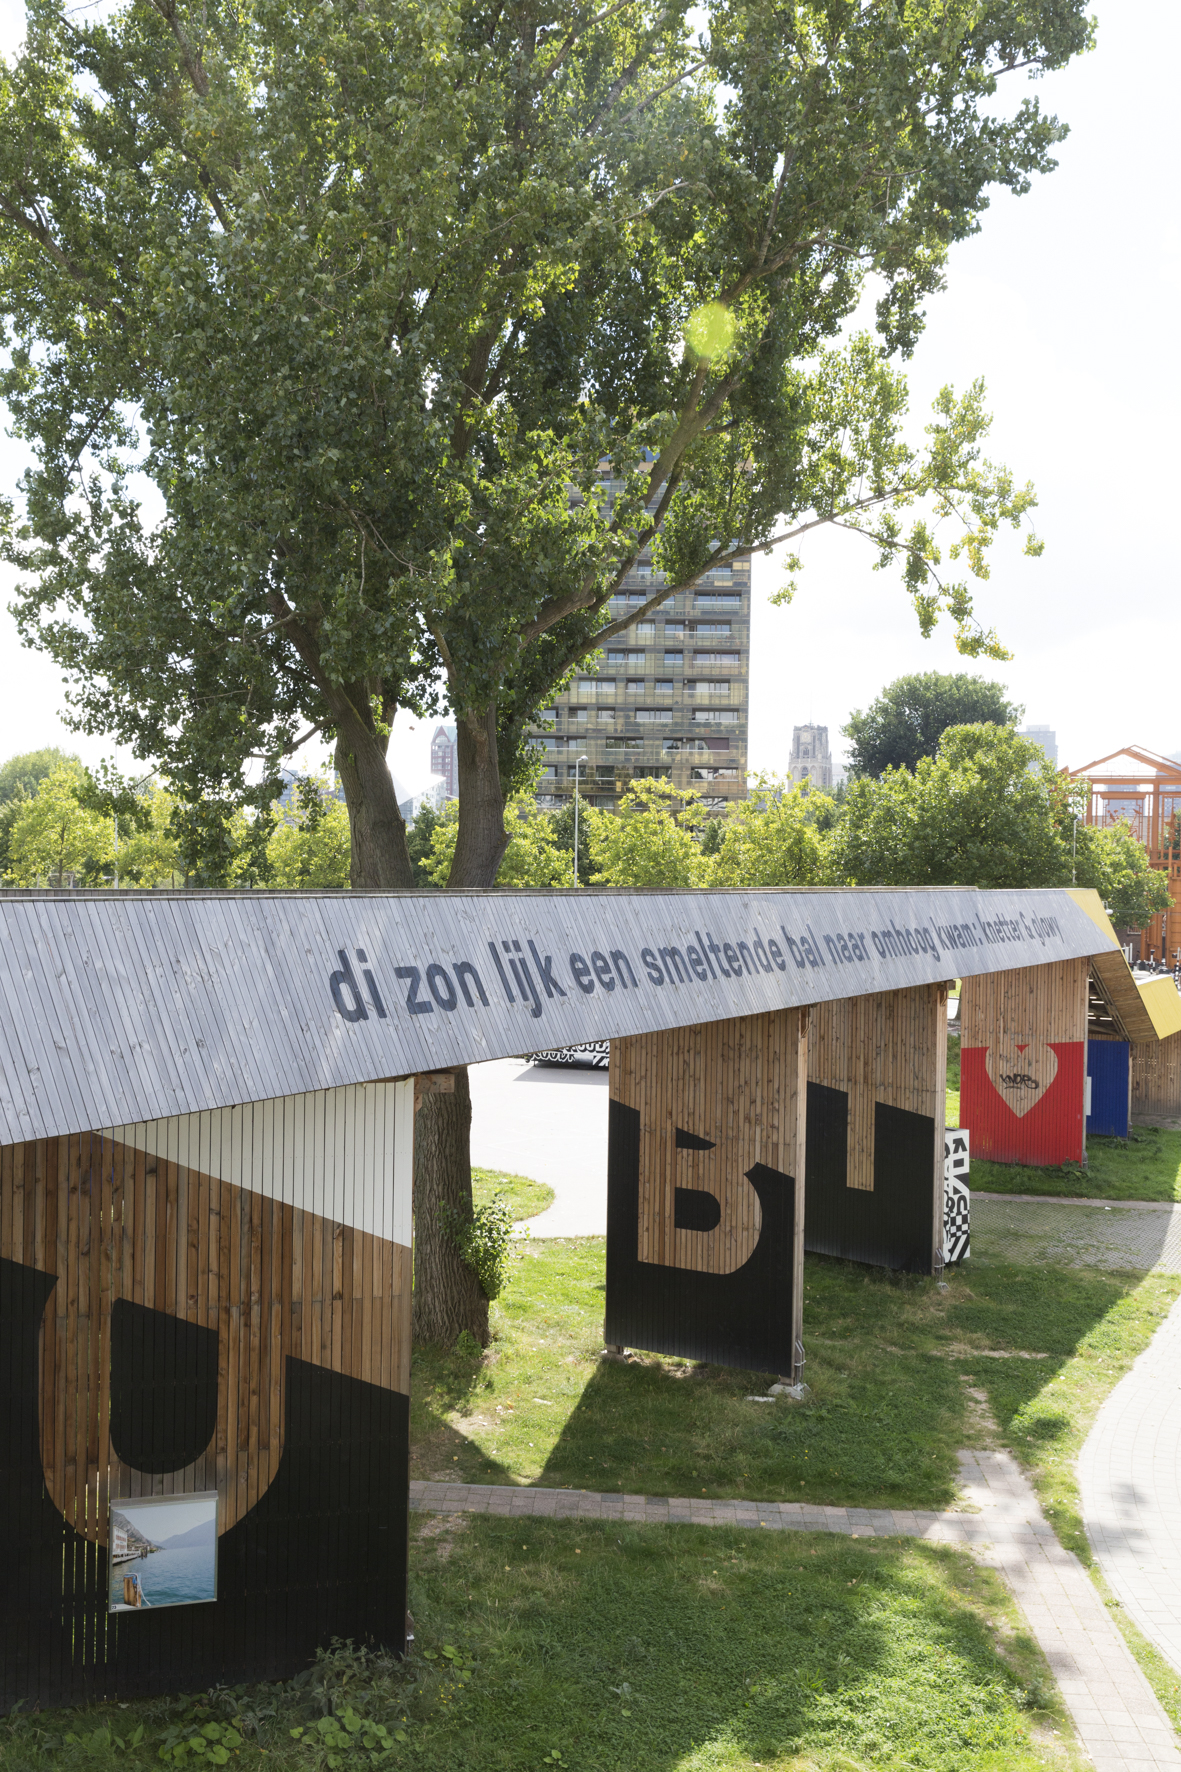 Talks & Treasures Rotterdam tour guide - 25 hotspots en mooie plekken